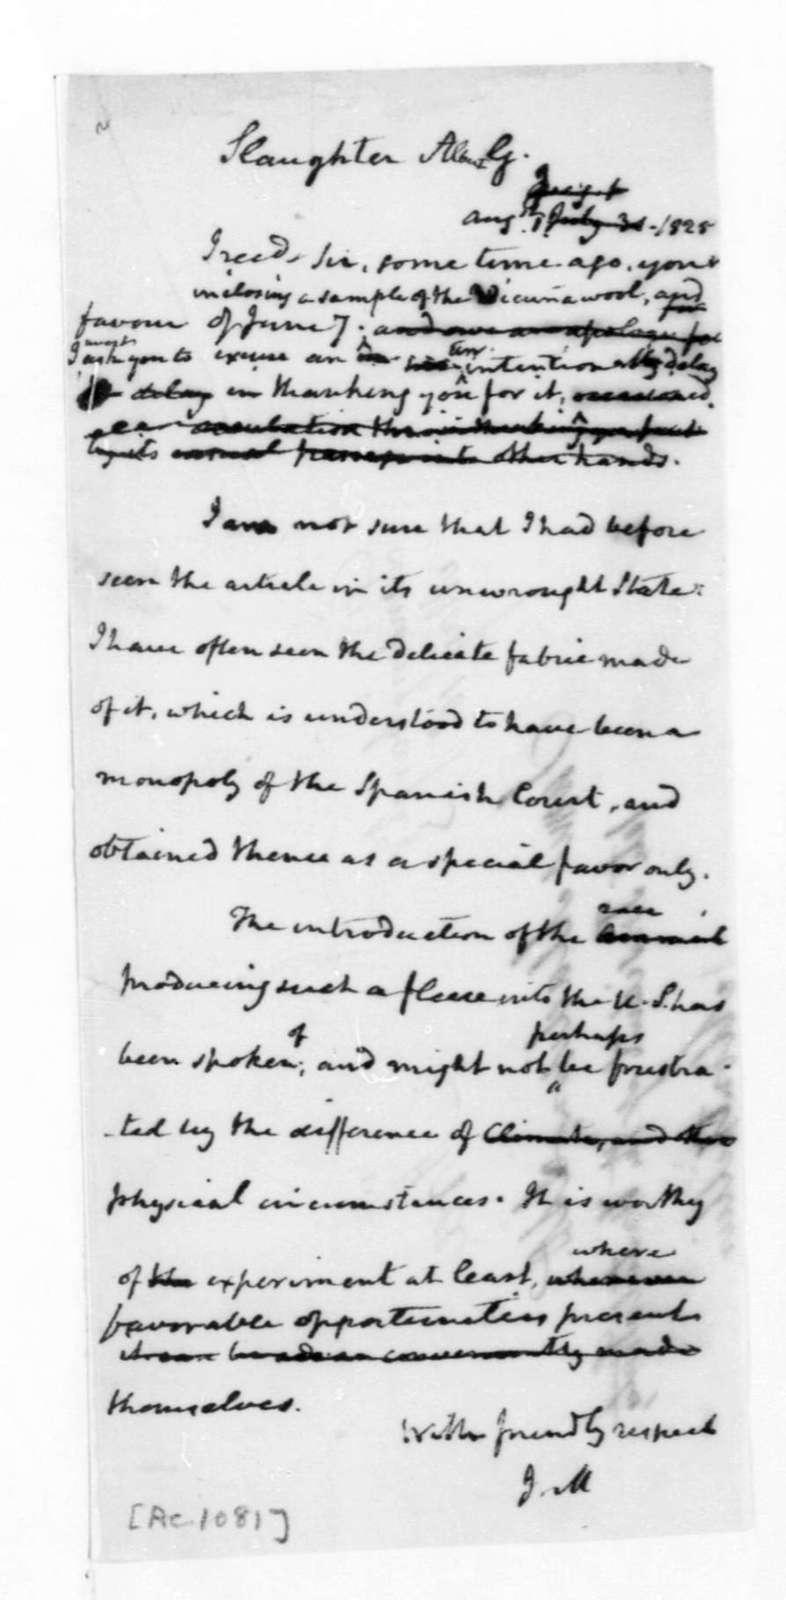 James Madison to Albert G. Slaughter, August 1, 1825.